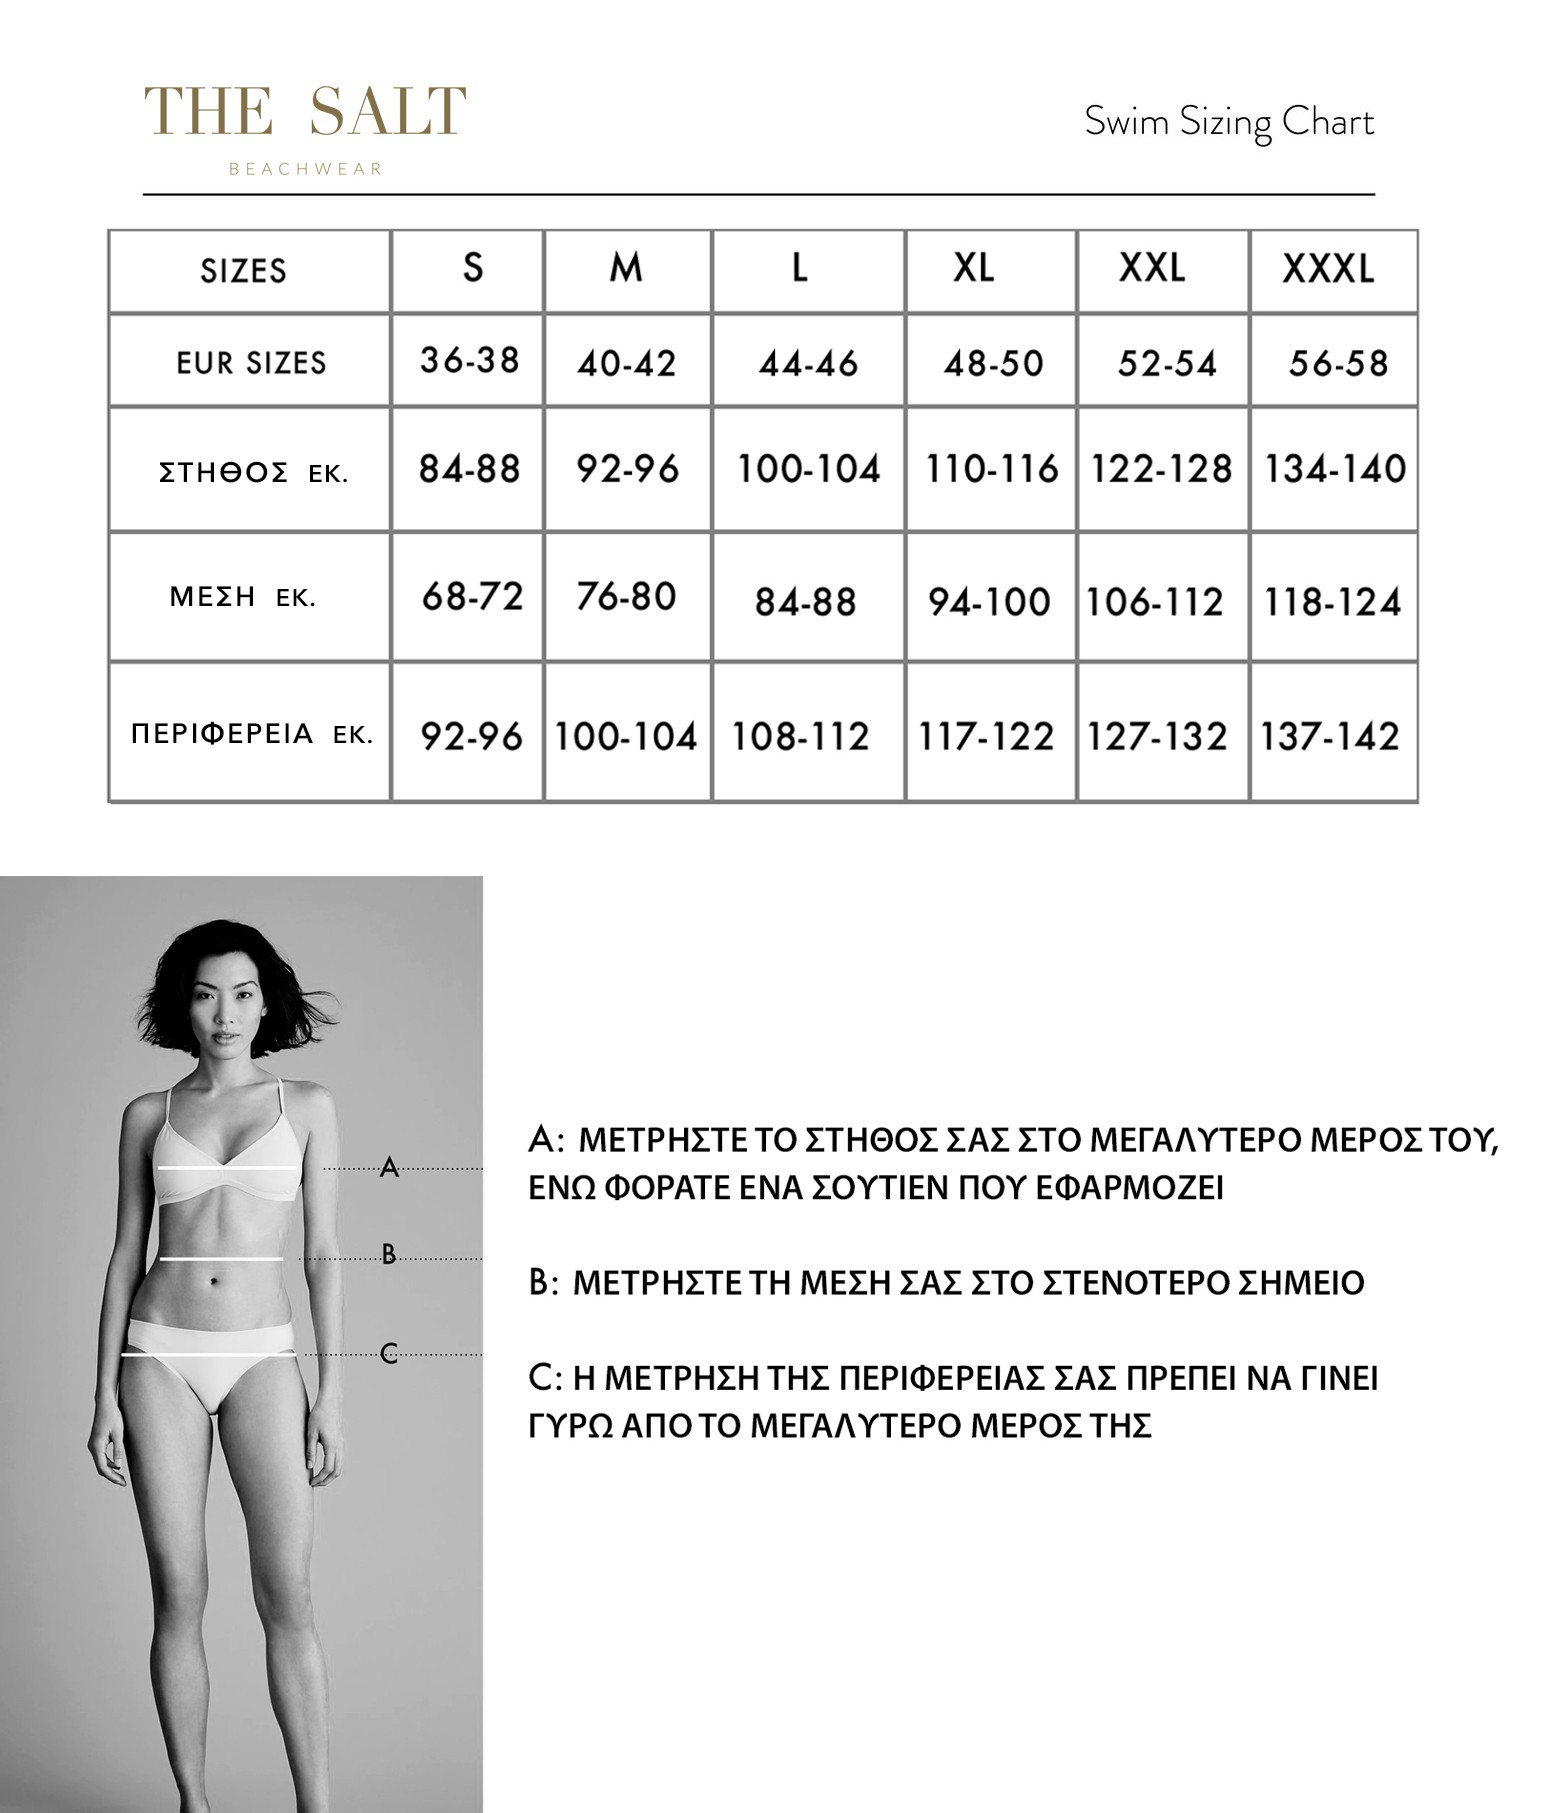 the salt beachwear size guide